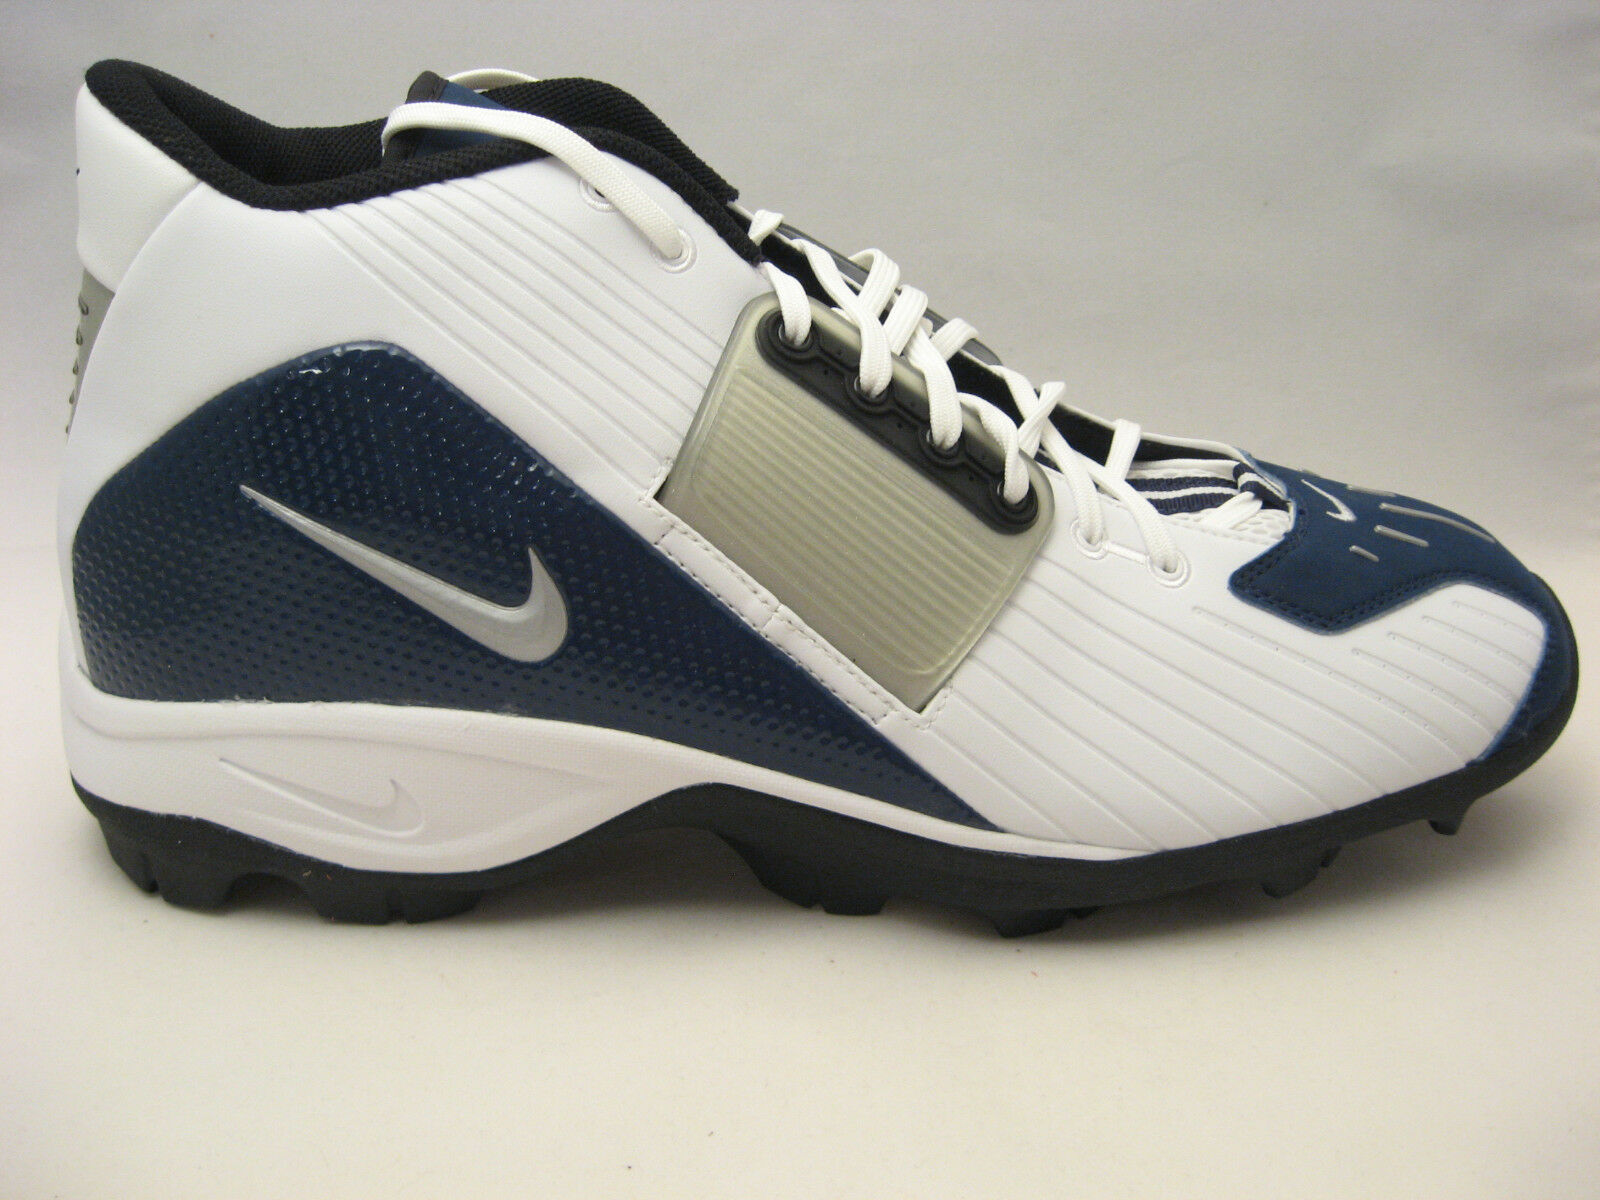 Nike air torque squalo territorio scarpe blu calcio calcio 15 bianco blu scarpe argento new 66bdae